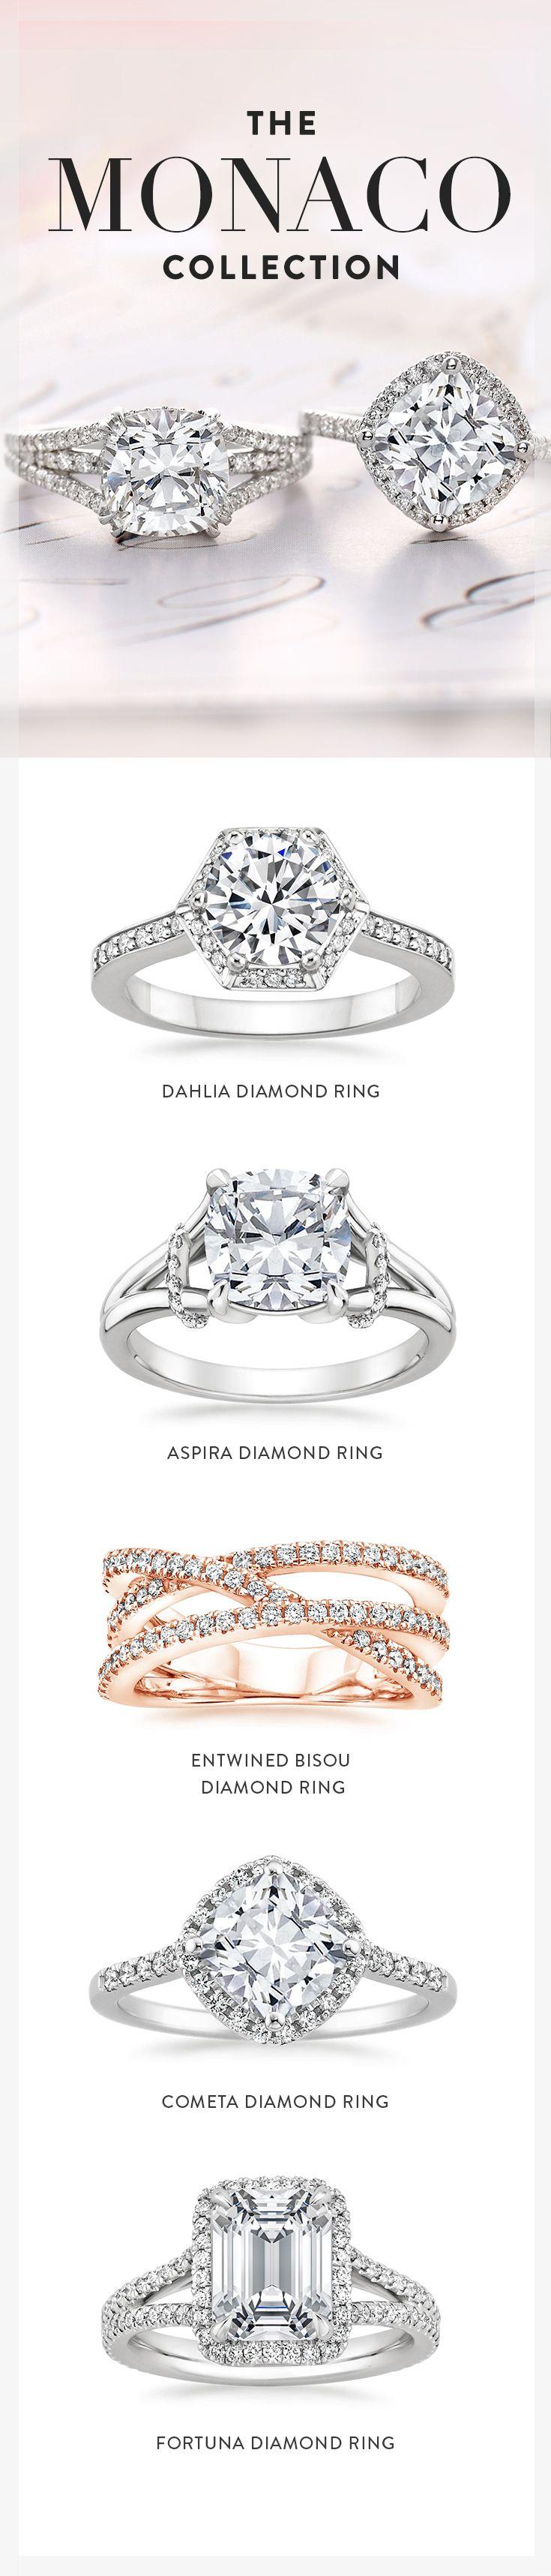 644 best Shiny Sparkly Diamonds images on Pinterest